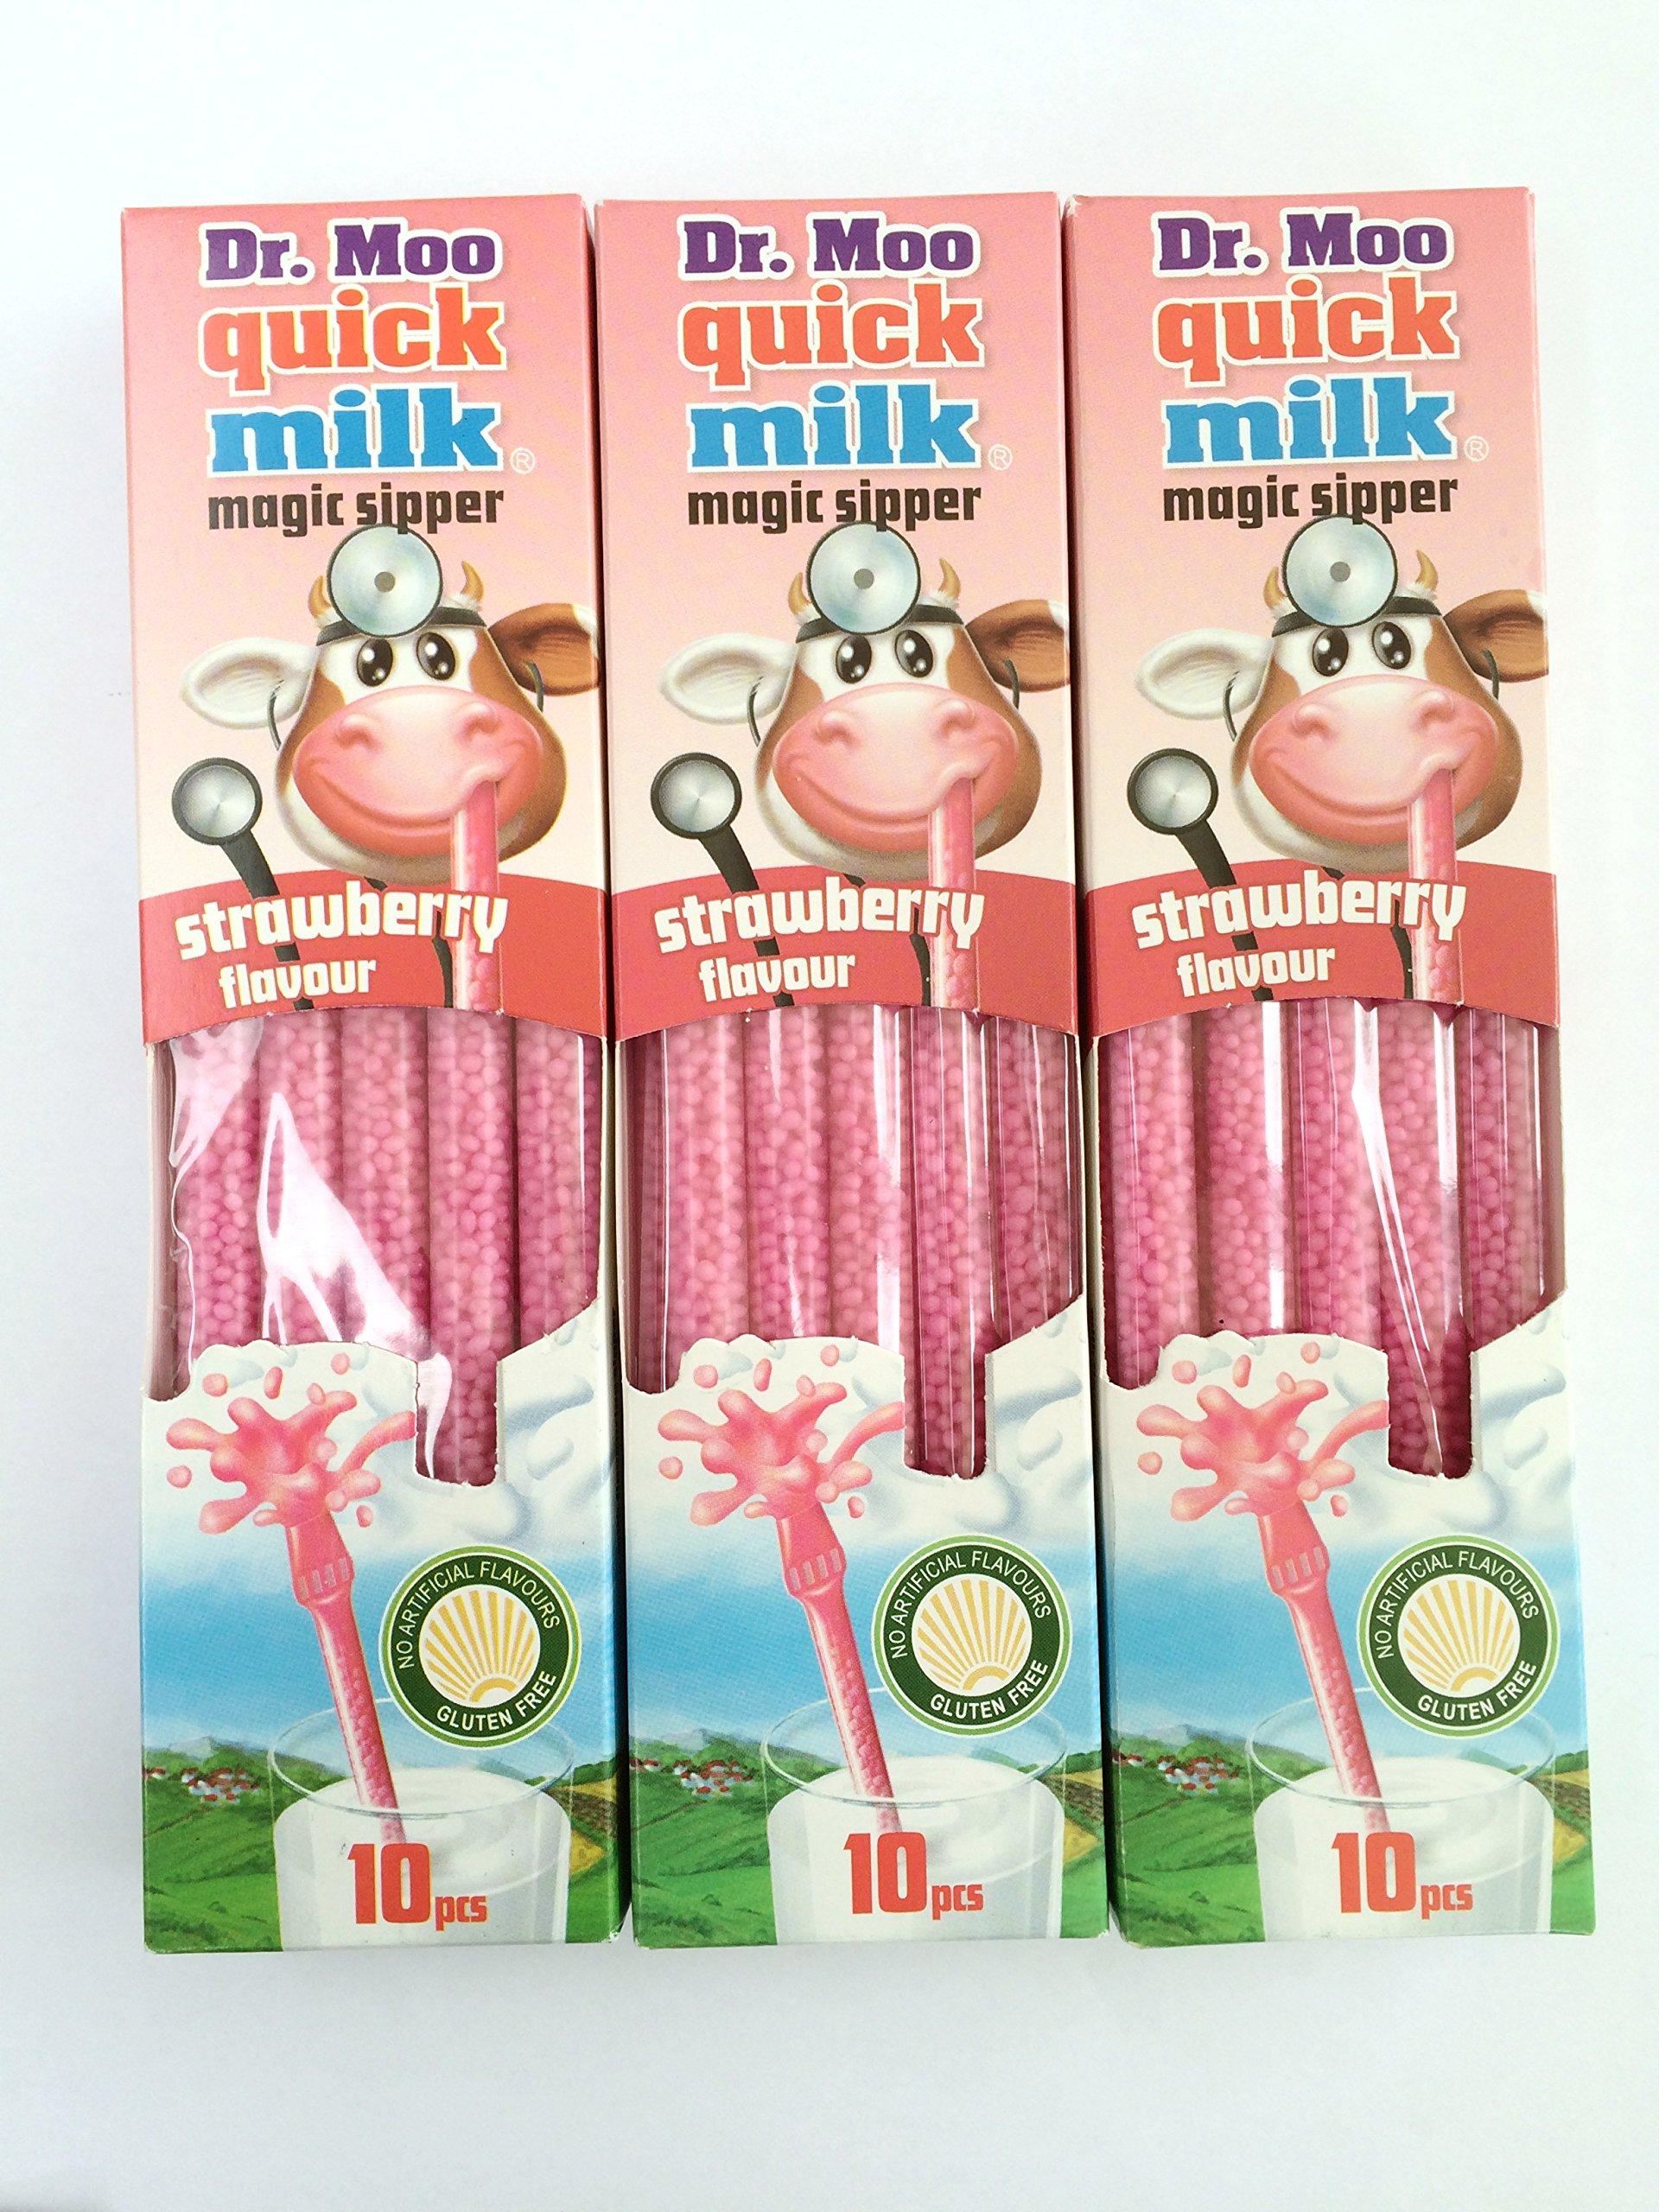 Dr Moo Magic Milk Magic Sipper Straws. Strawberry Flavour 3 x Packs (30 straws)